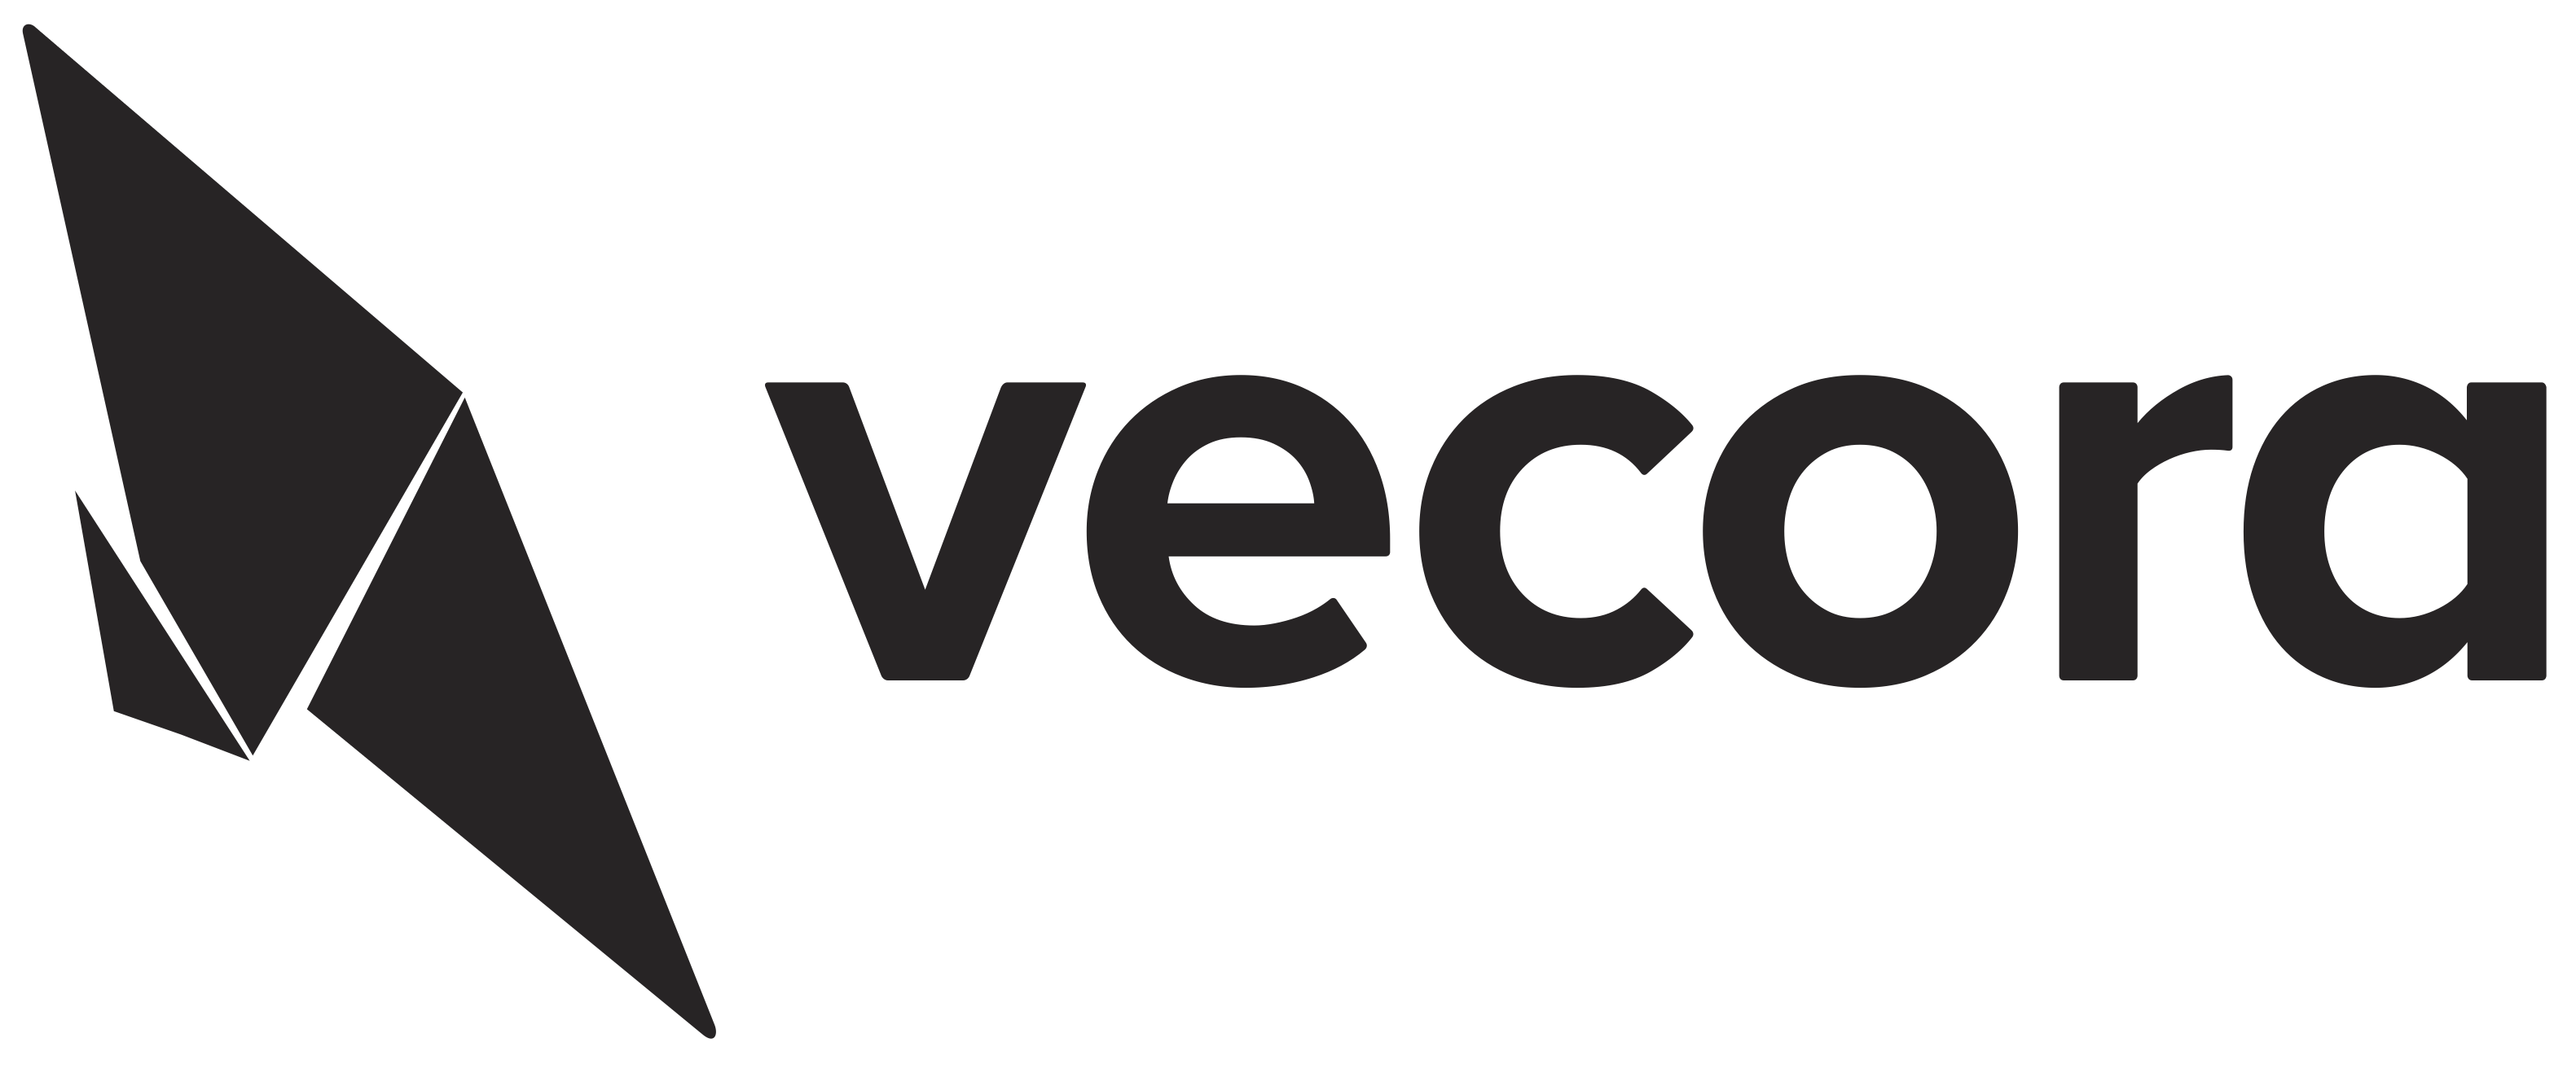 5485b5903be47df4558e188d_vecora-logo-k.png